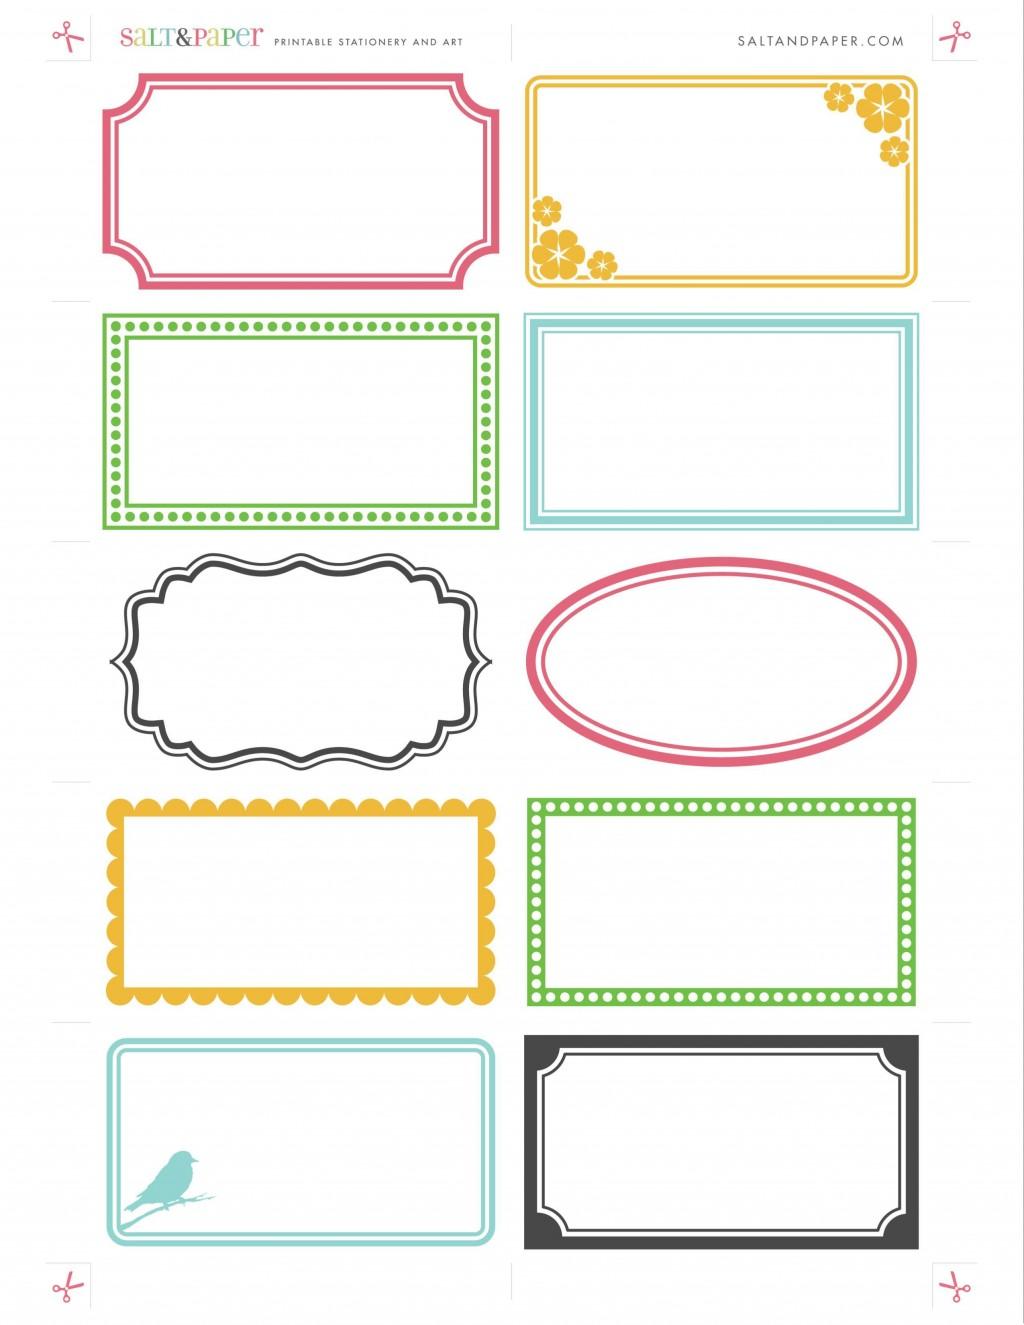 007 Impressive Free Printable Busines Template Image  Templates Card For Google Doc Budget Microsoft WordLarge